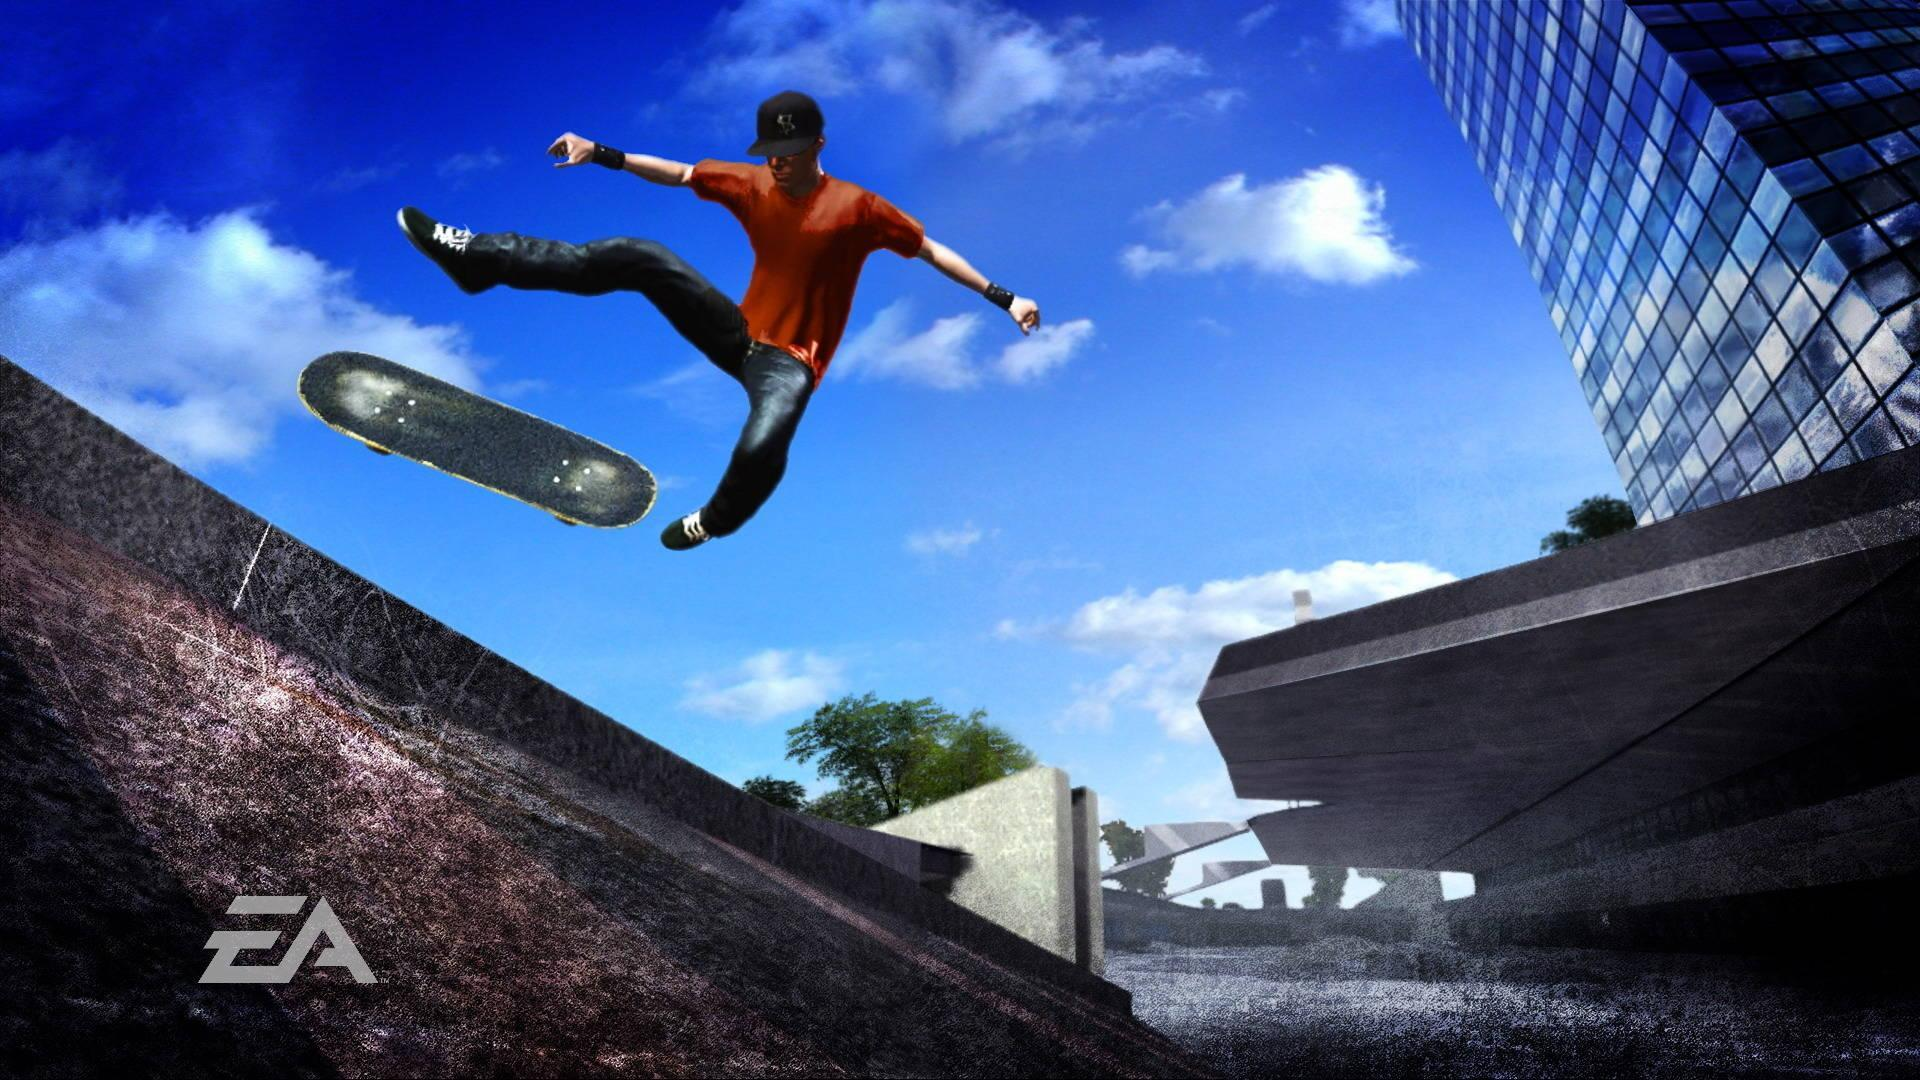 Wallpapers For > Skate 3 Wallpaper Hd